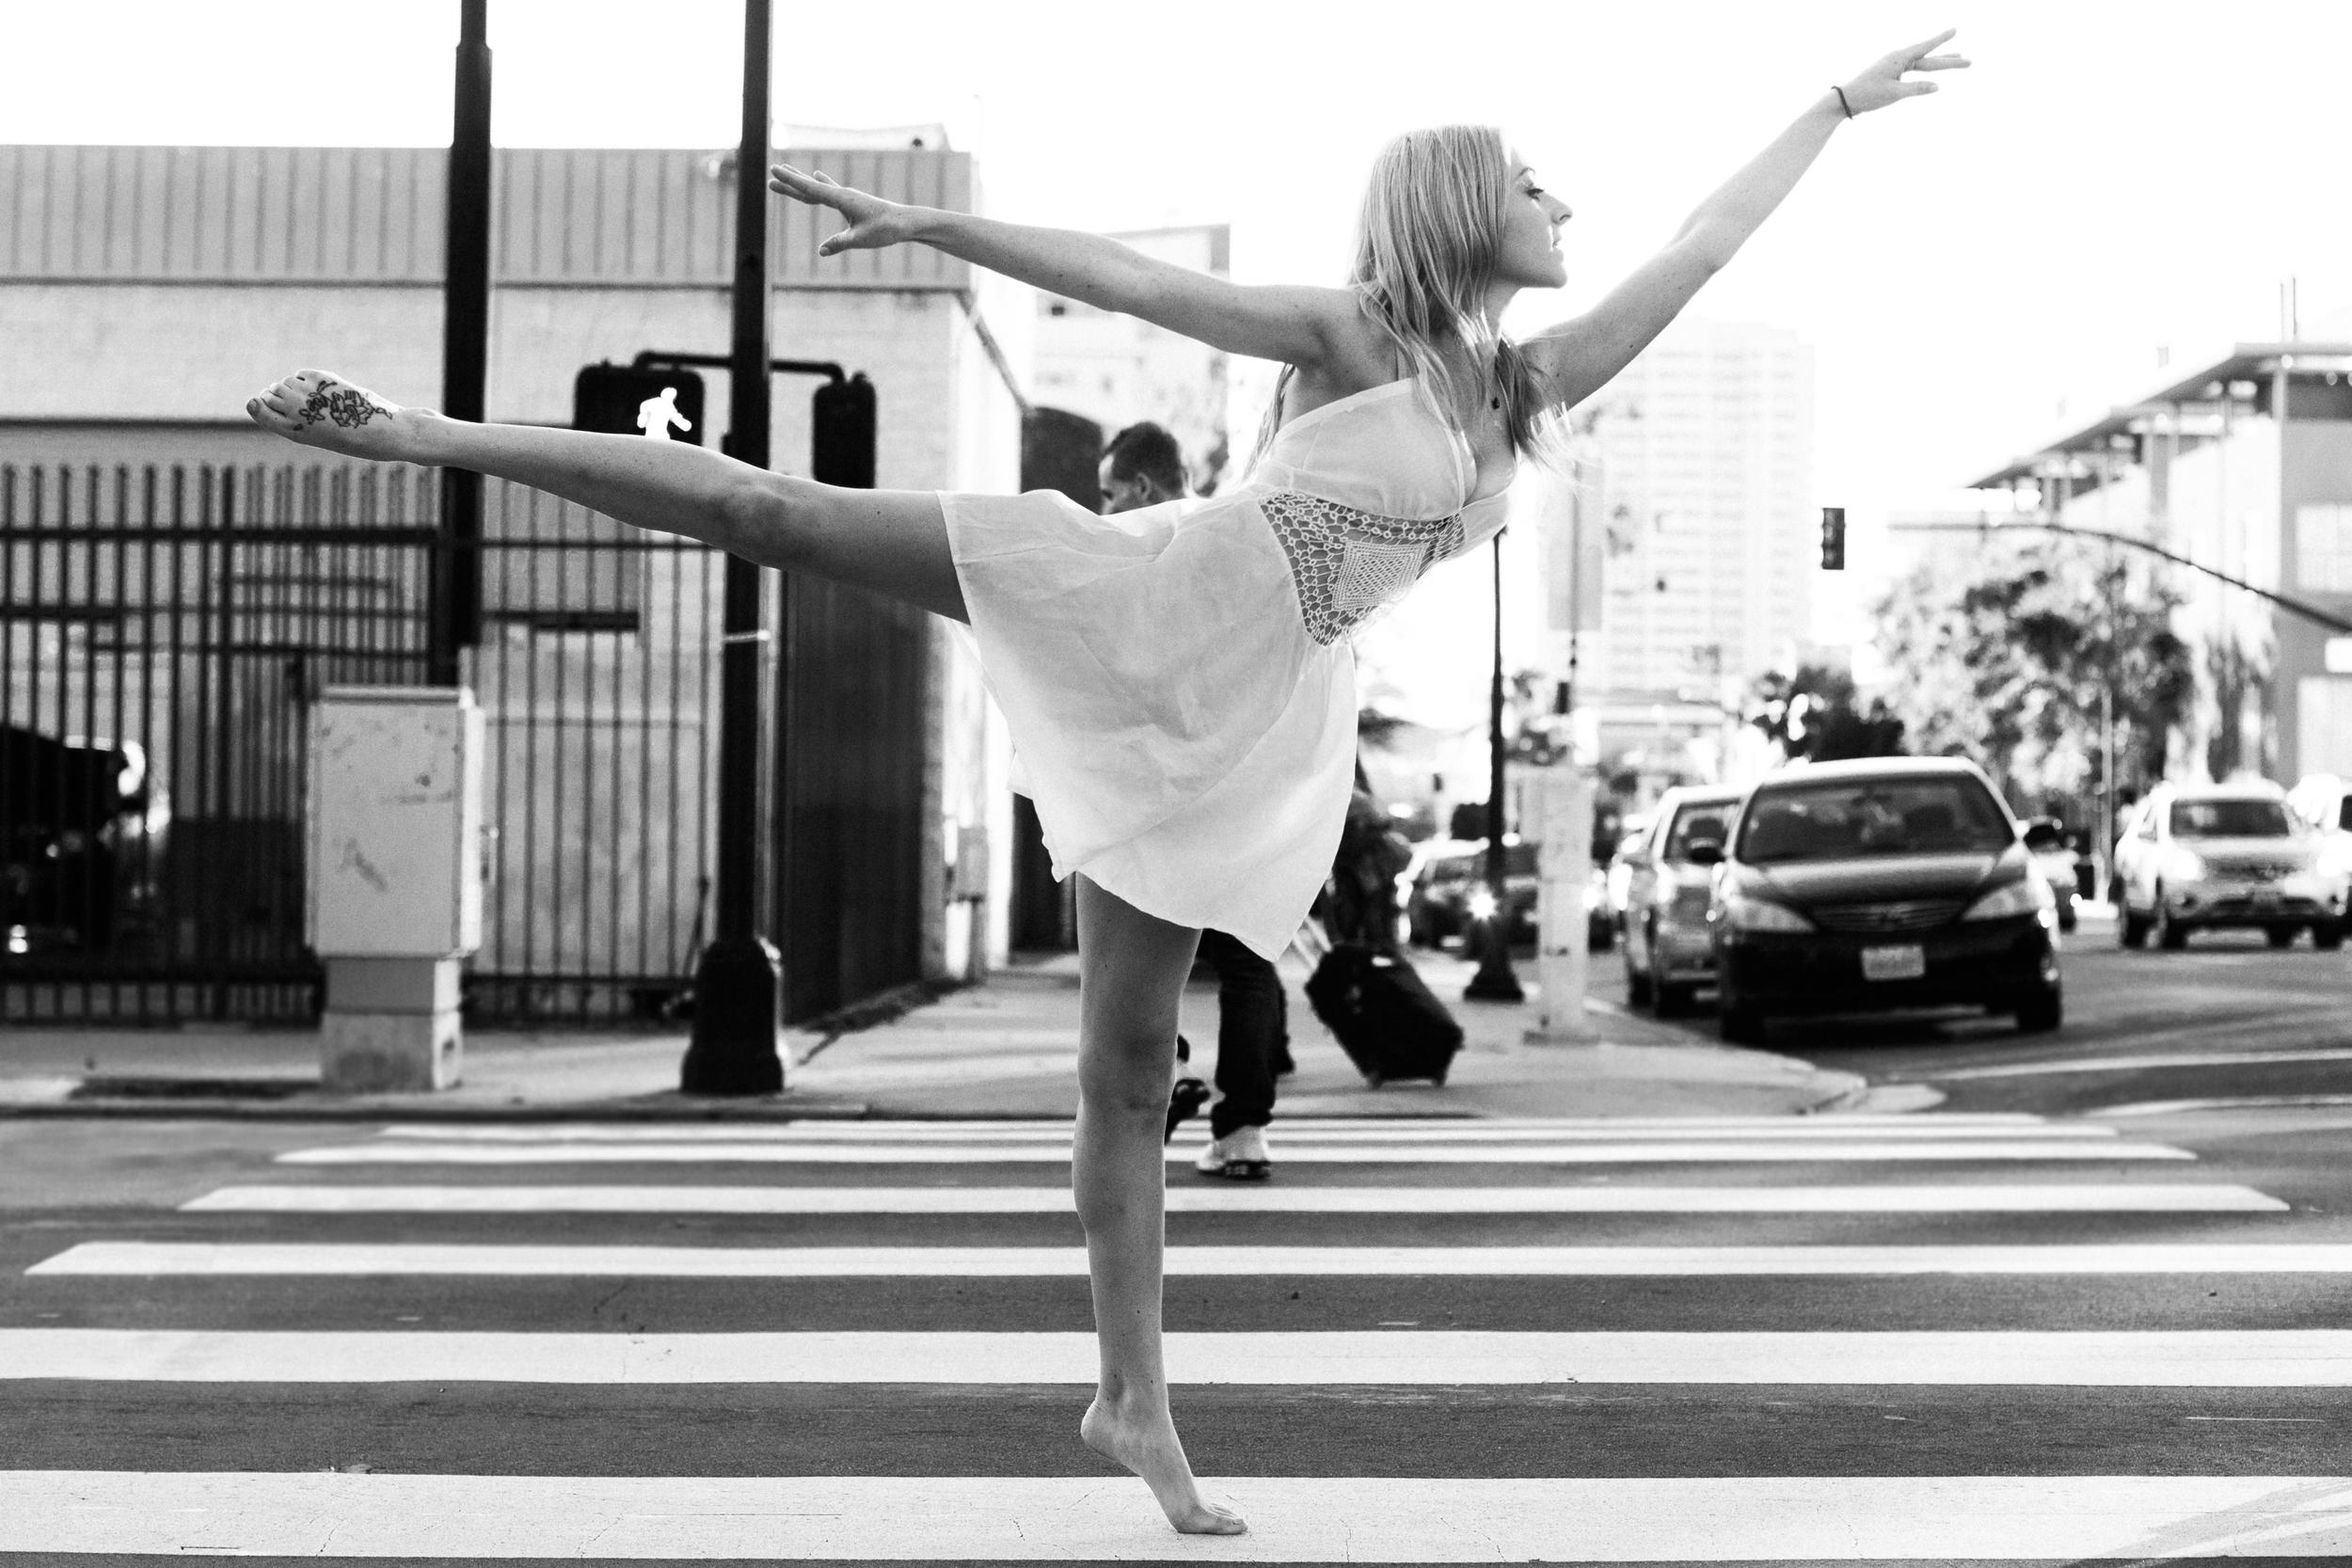 san diego wedding   photographer | monotone side view shot of barefoot blonde woman doing penche   on pedestrian lane